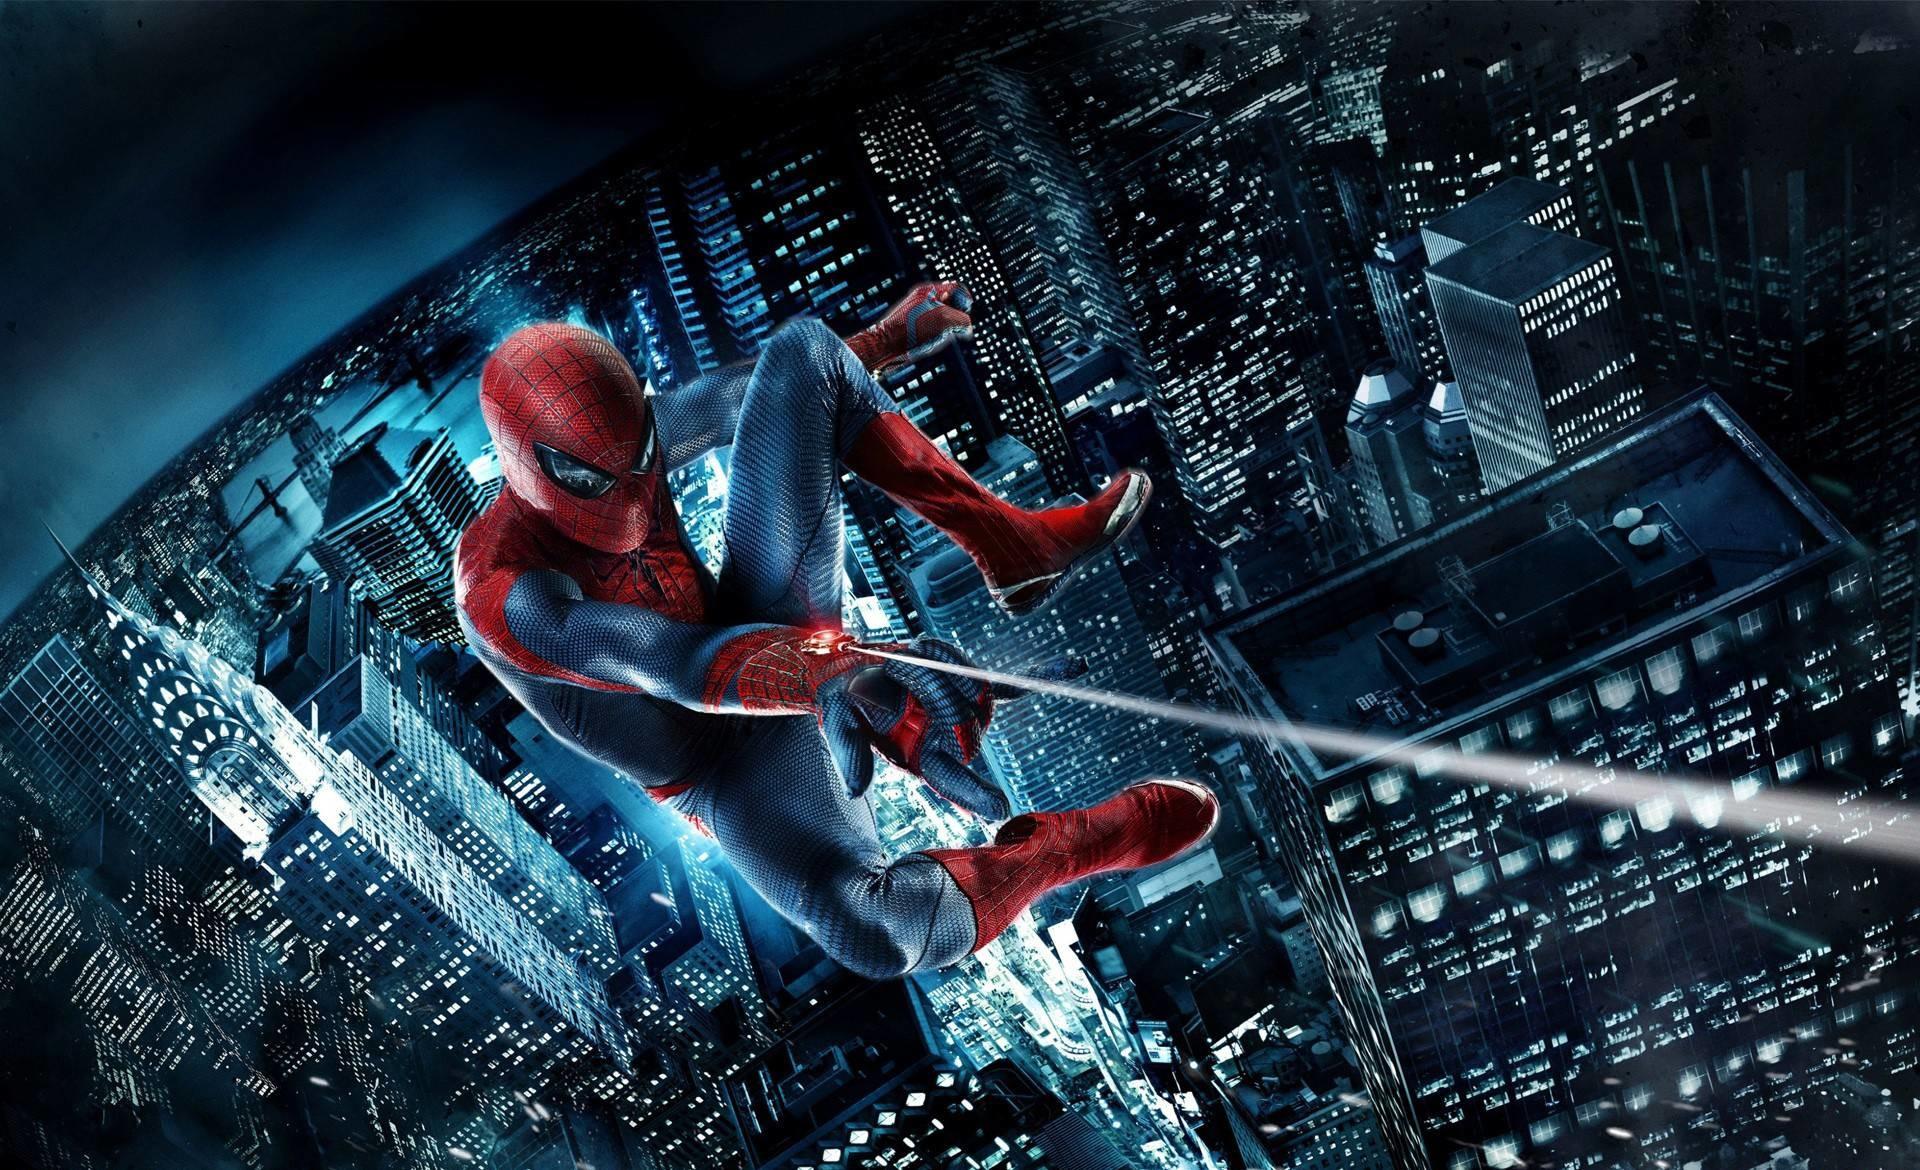 Spiderman Desktop Wallpapers and Background